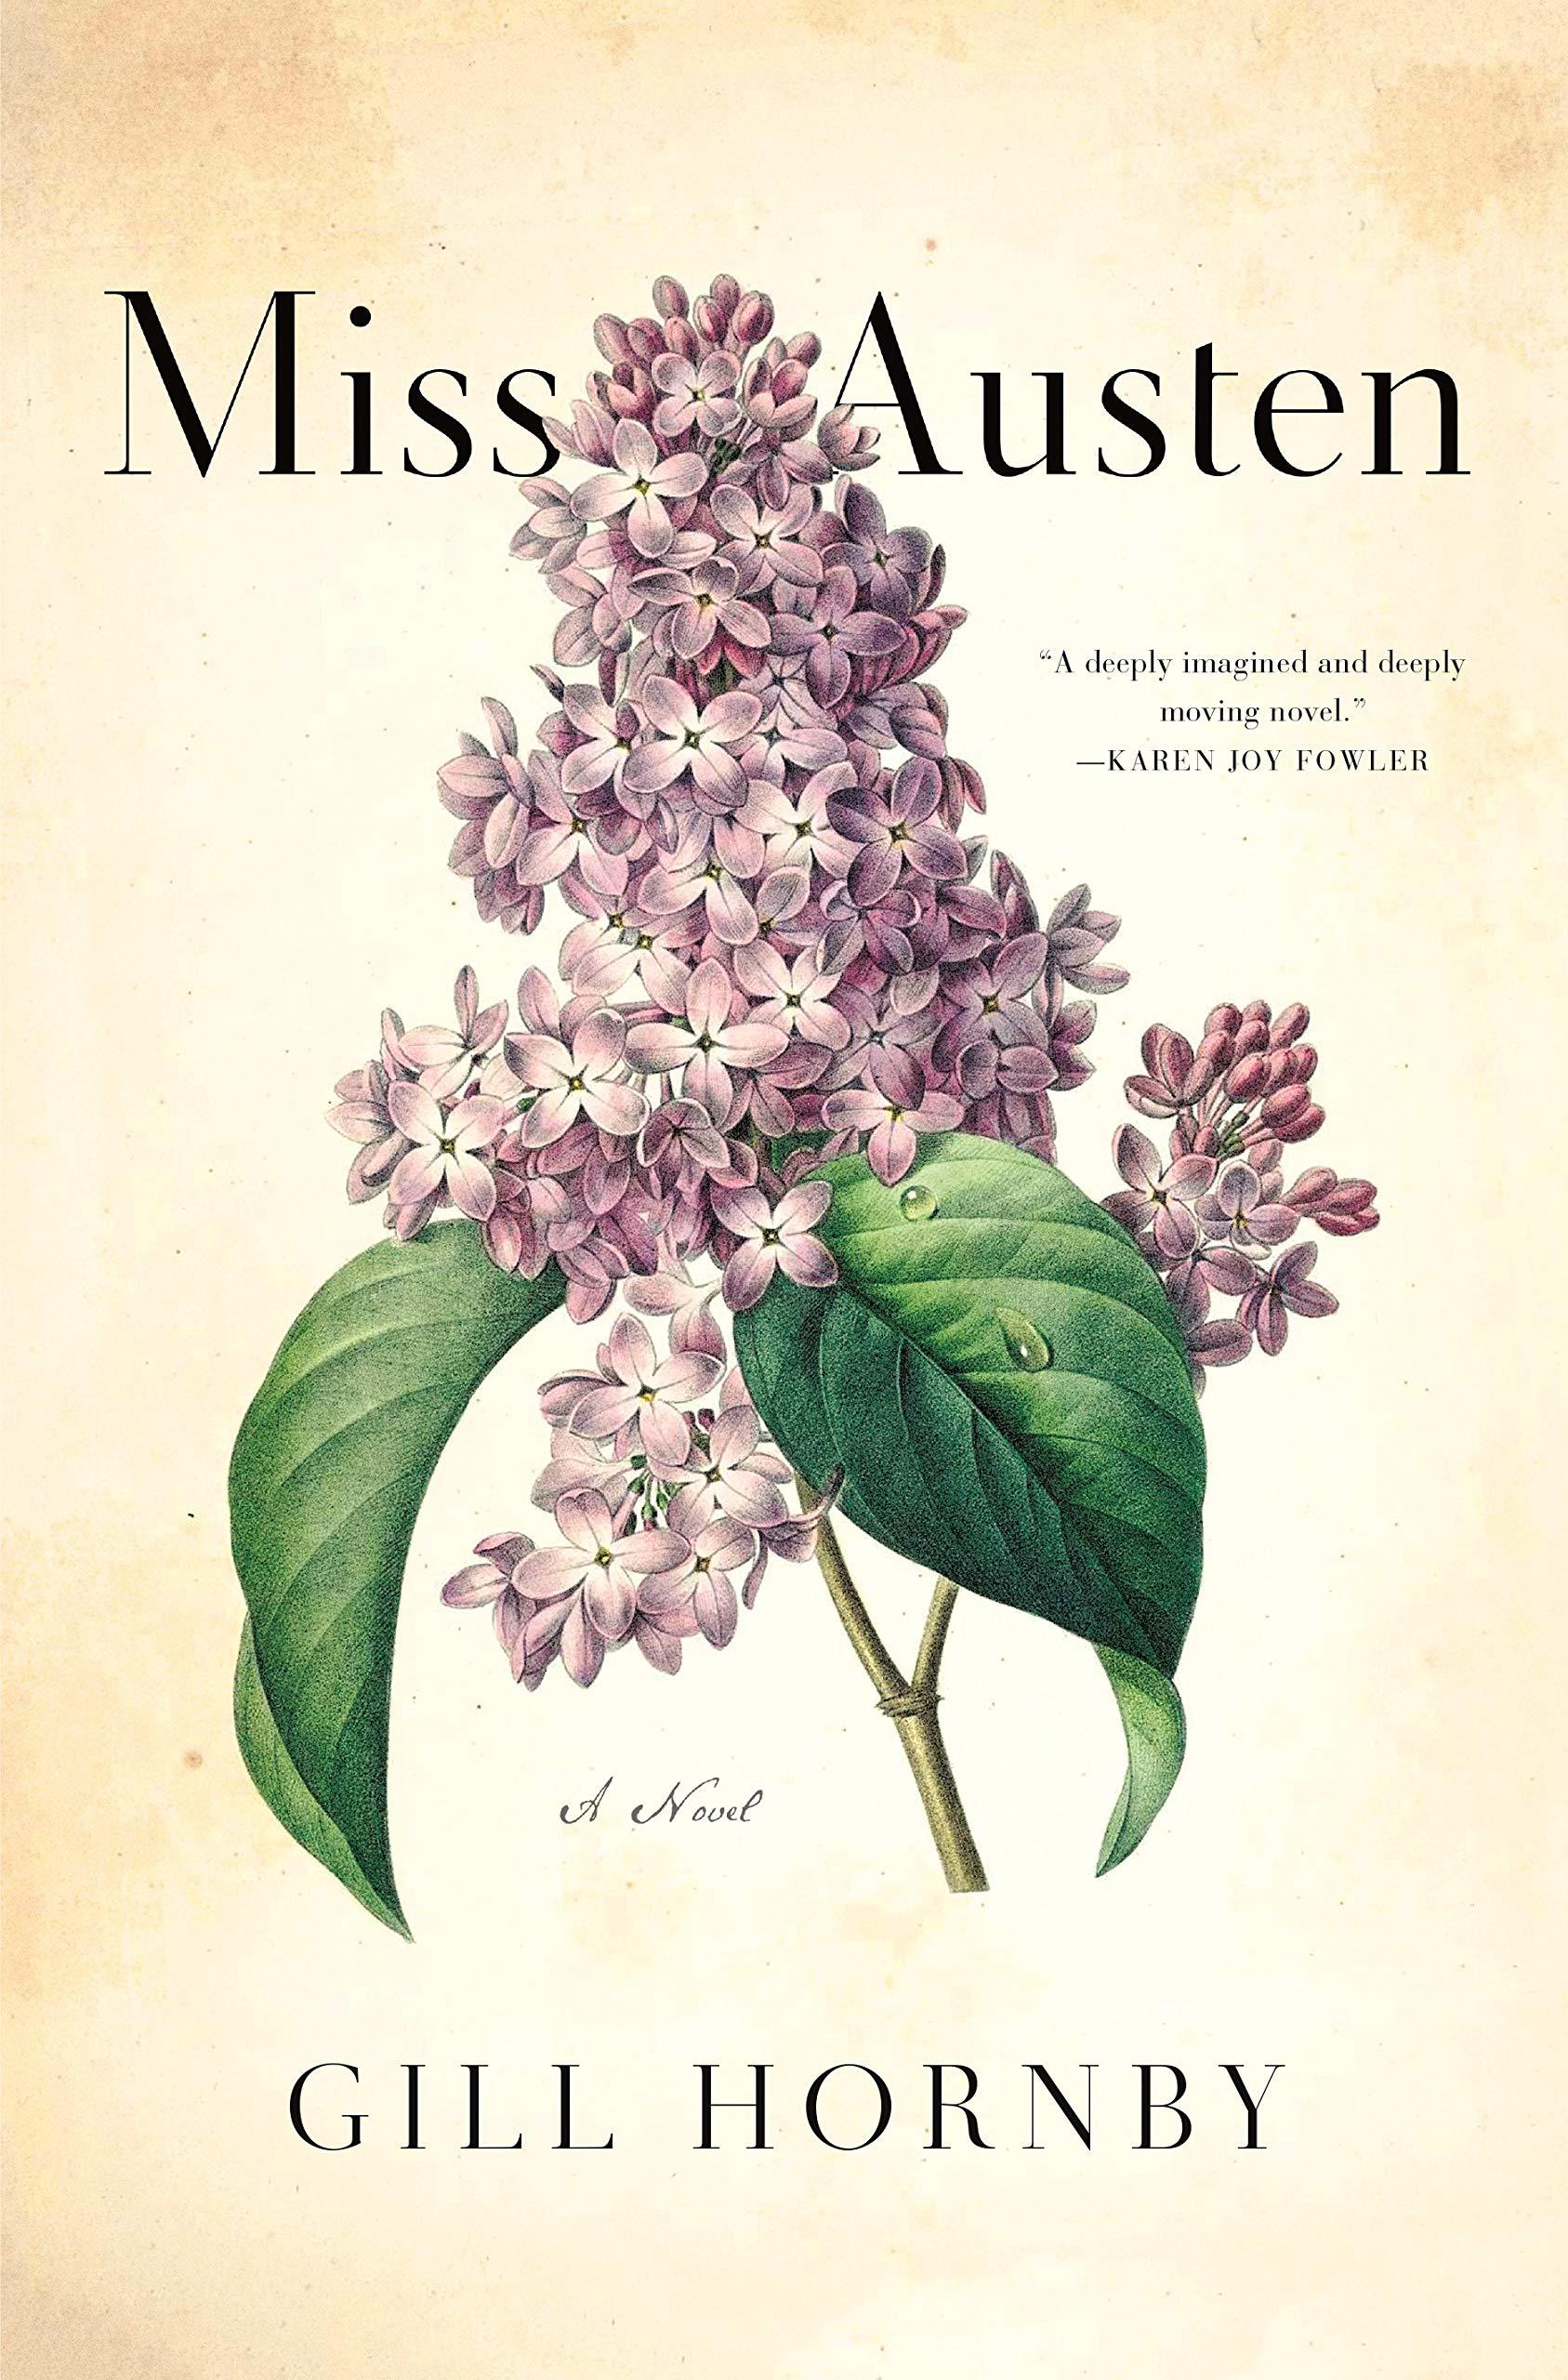 Miss Austen: Amazon.it: Hornby, Gill: Libri in altre lingue